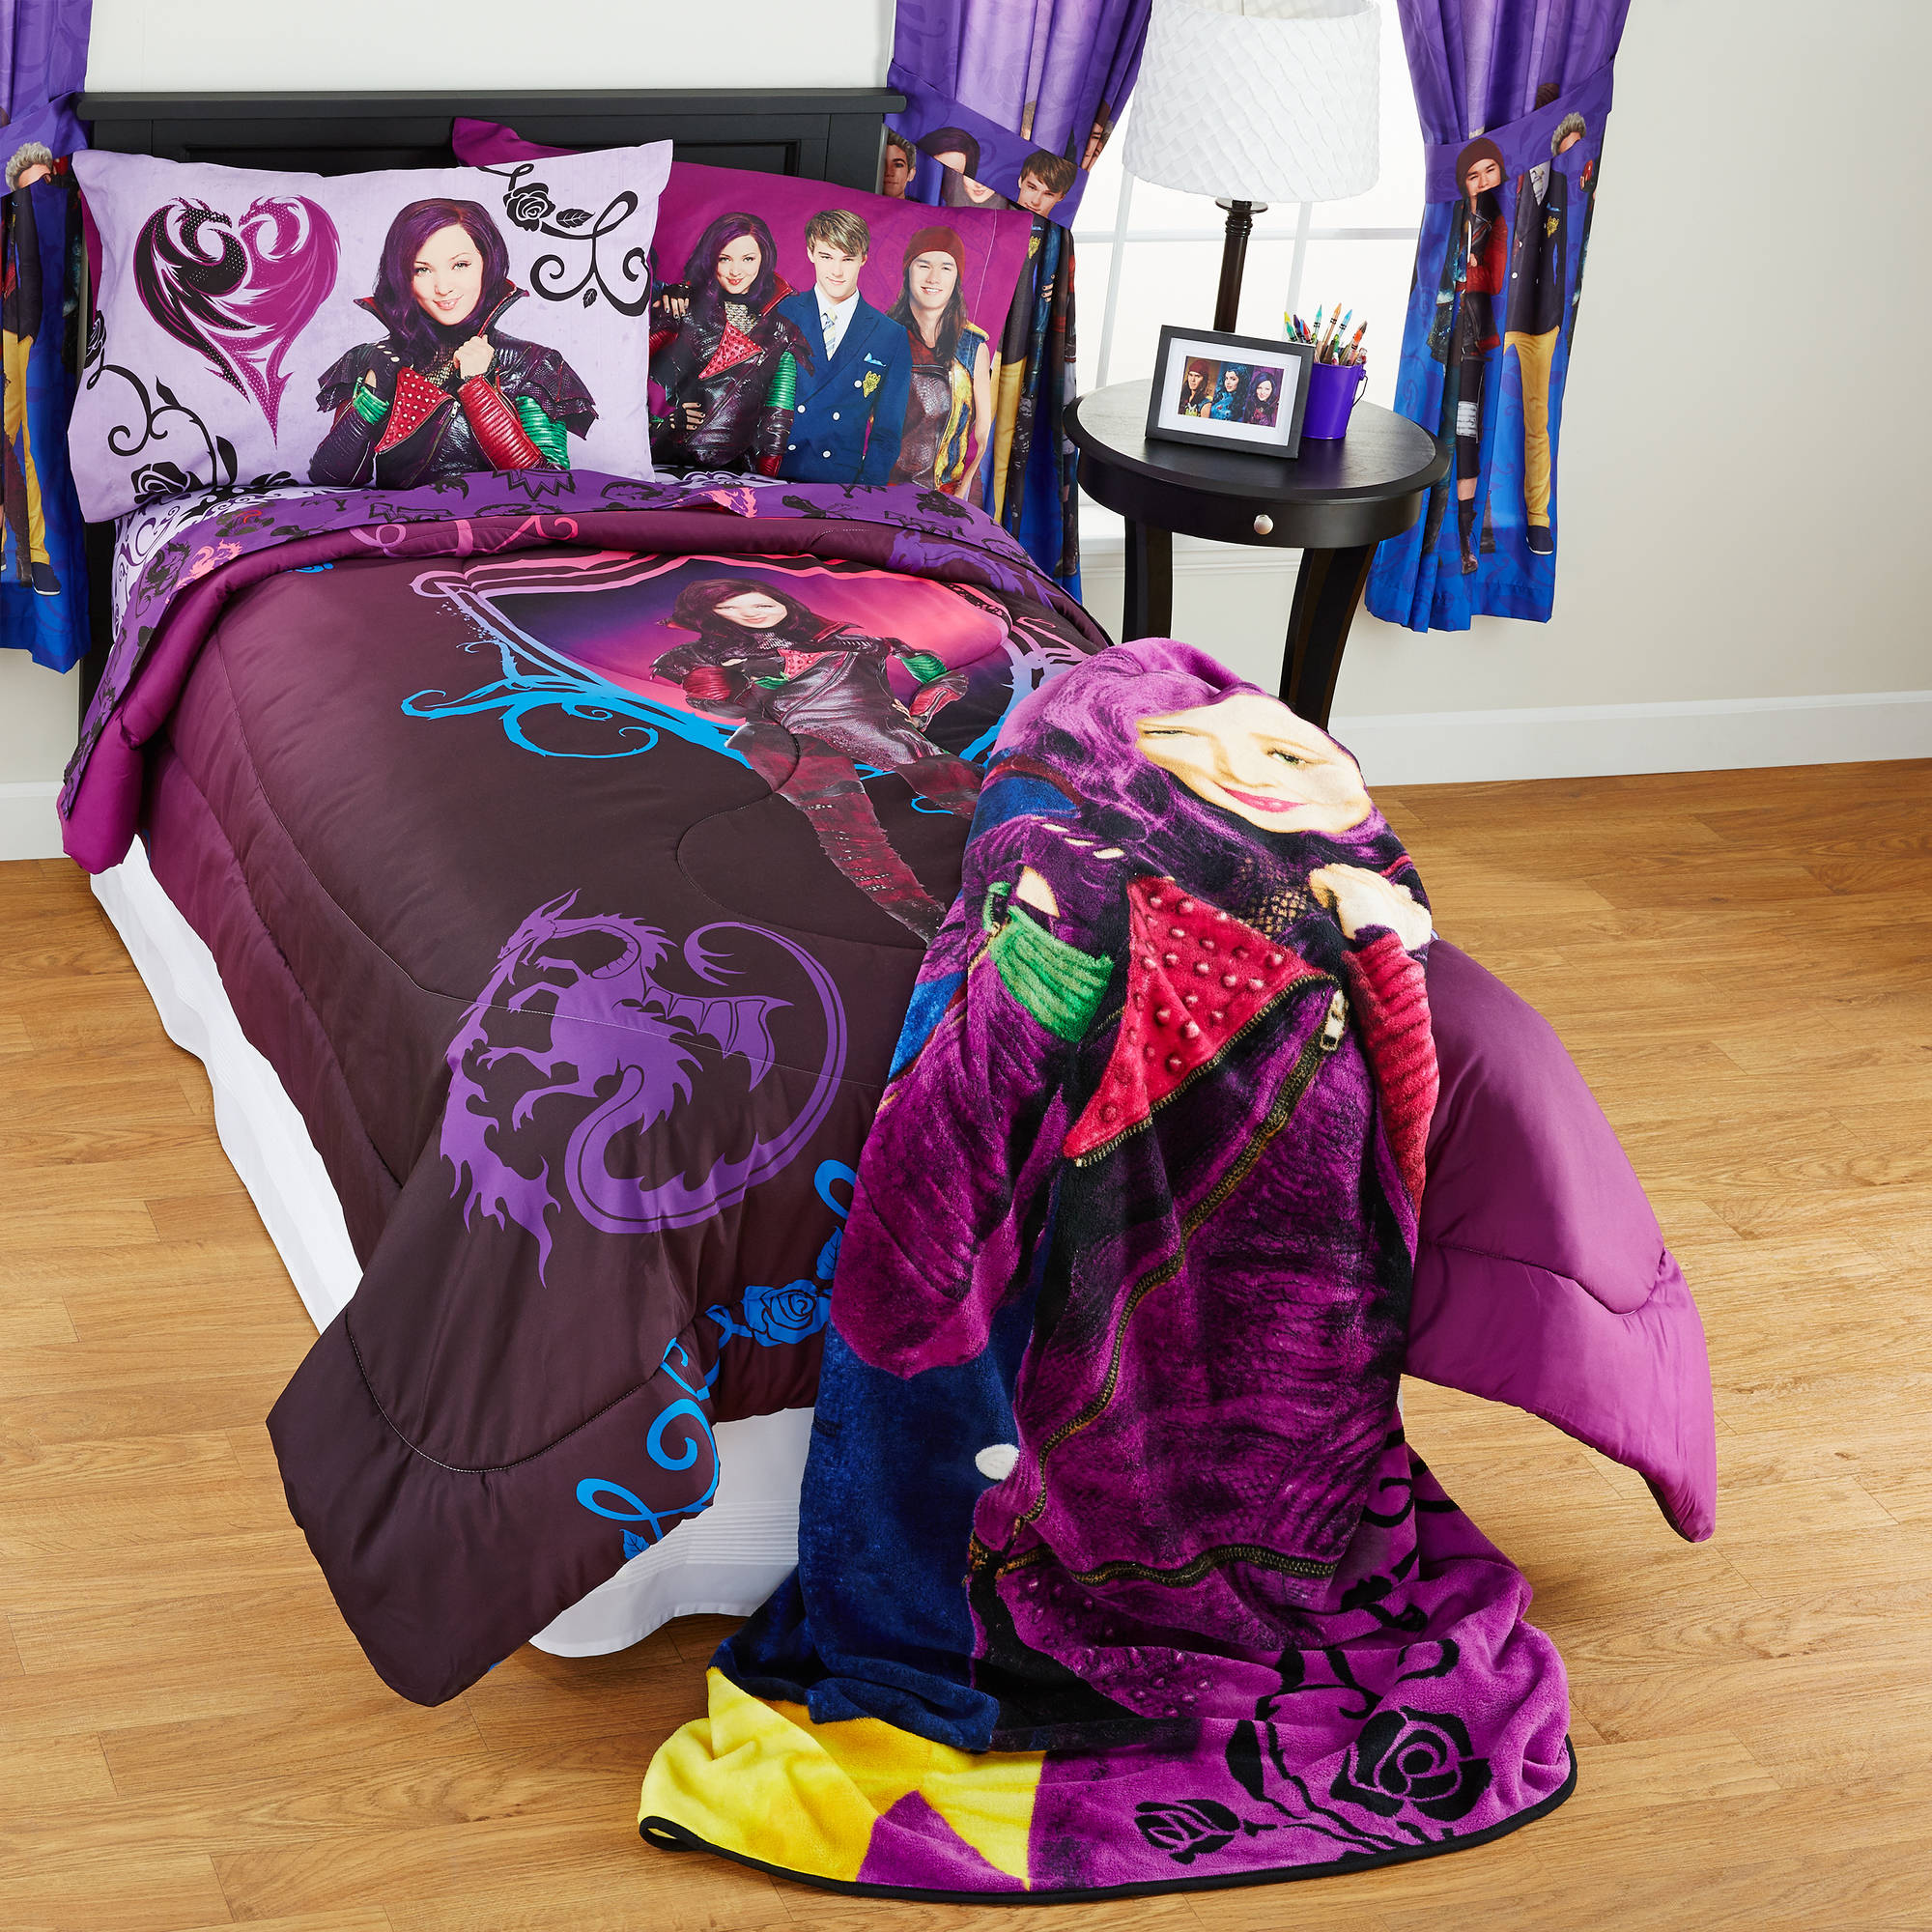 Super The Descendants Room Collection - Walmart.com NF29